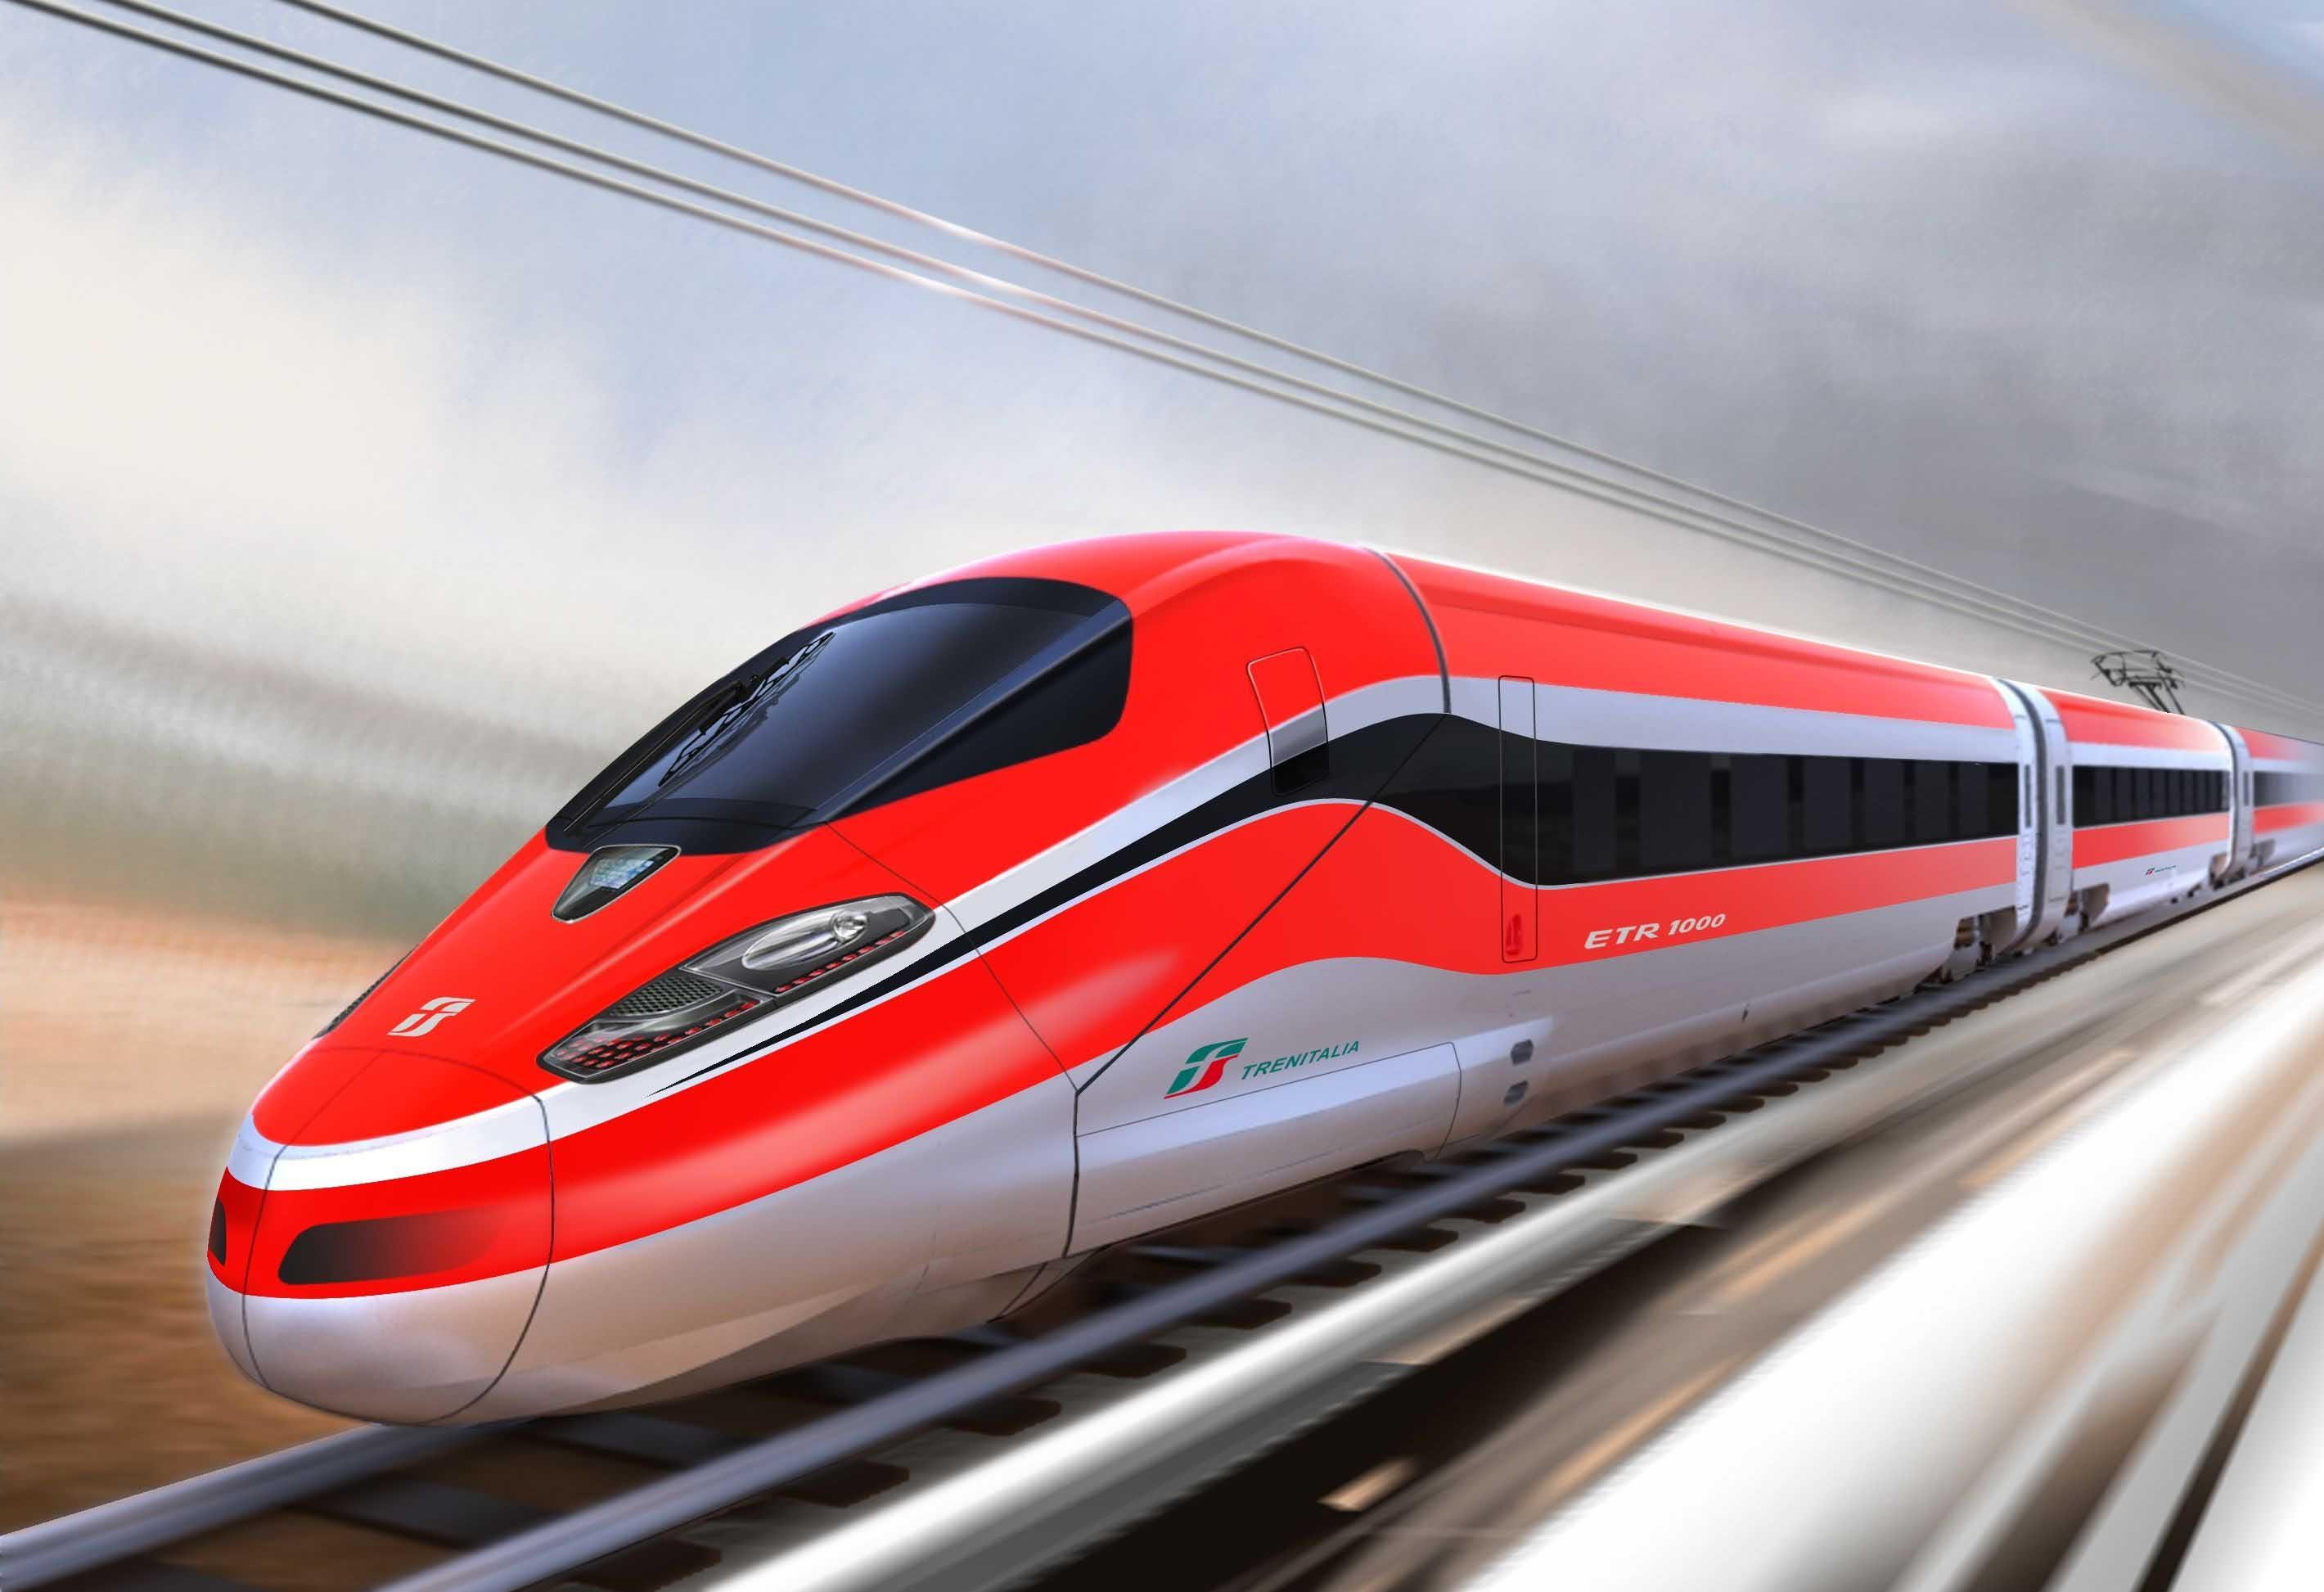 ETR 500 Frecciarossa italian high-speed train